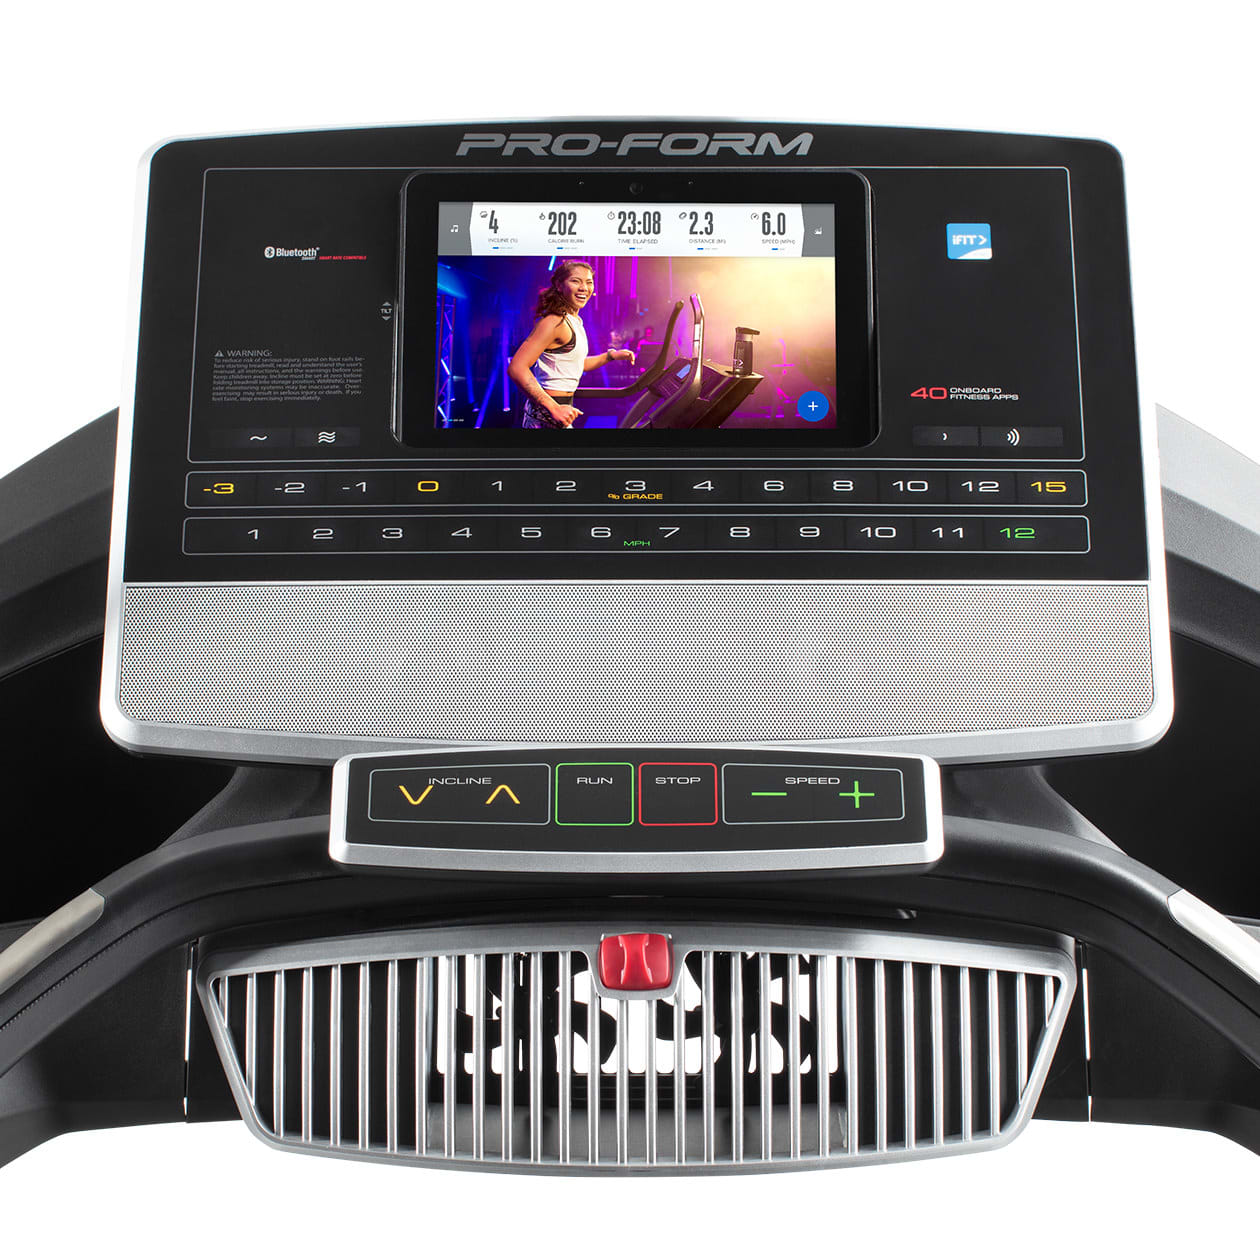 Proform Treadmills SMART Pro 9000  gallery image 5